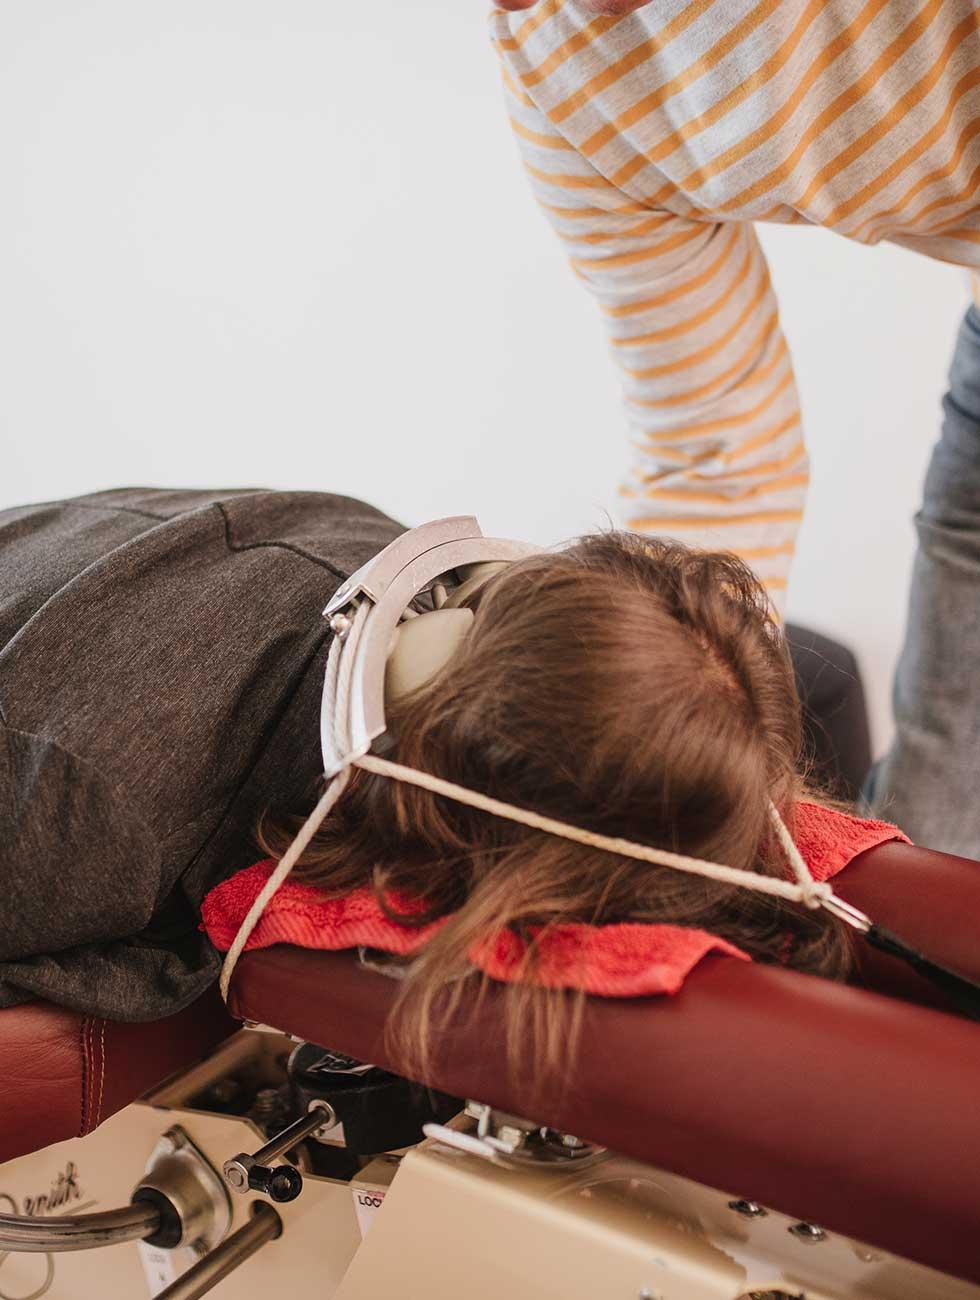 Bandscheibenvorfall: Meine Behandlung | Bandscheibenvorfall Prolaps, Lendenwirbelsäule LWS, Halswirbelsäule HWS, Brustwirbelsäule BWS